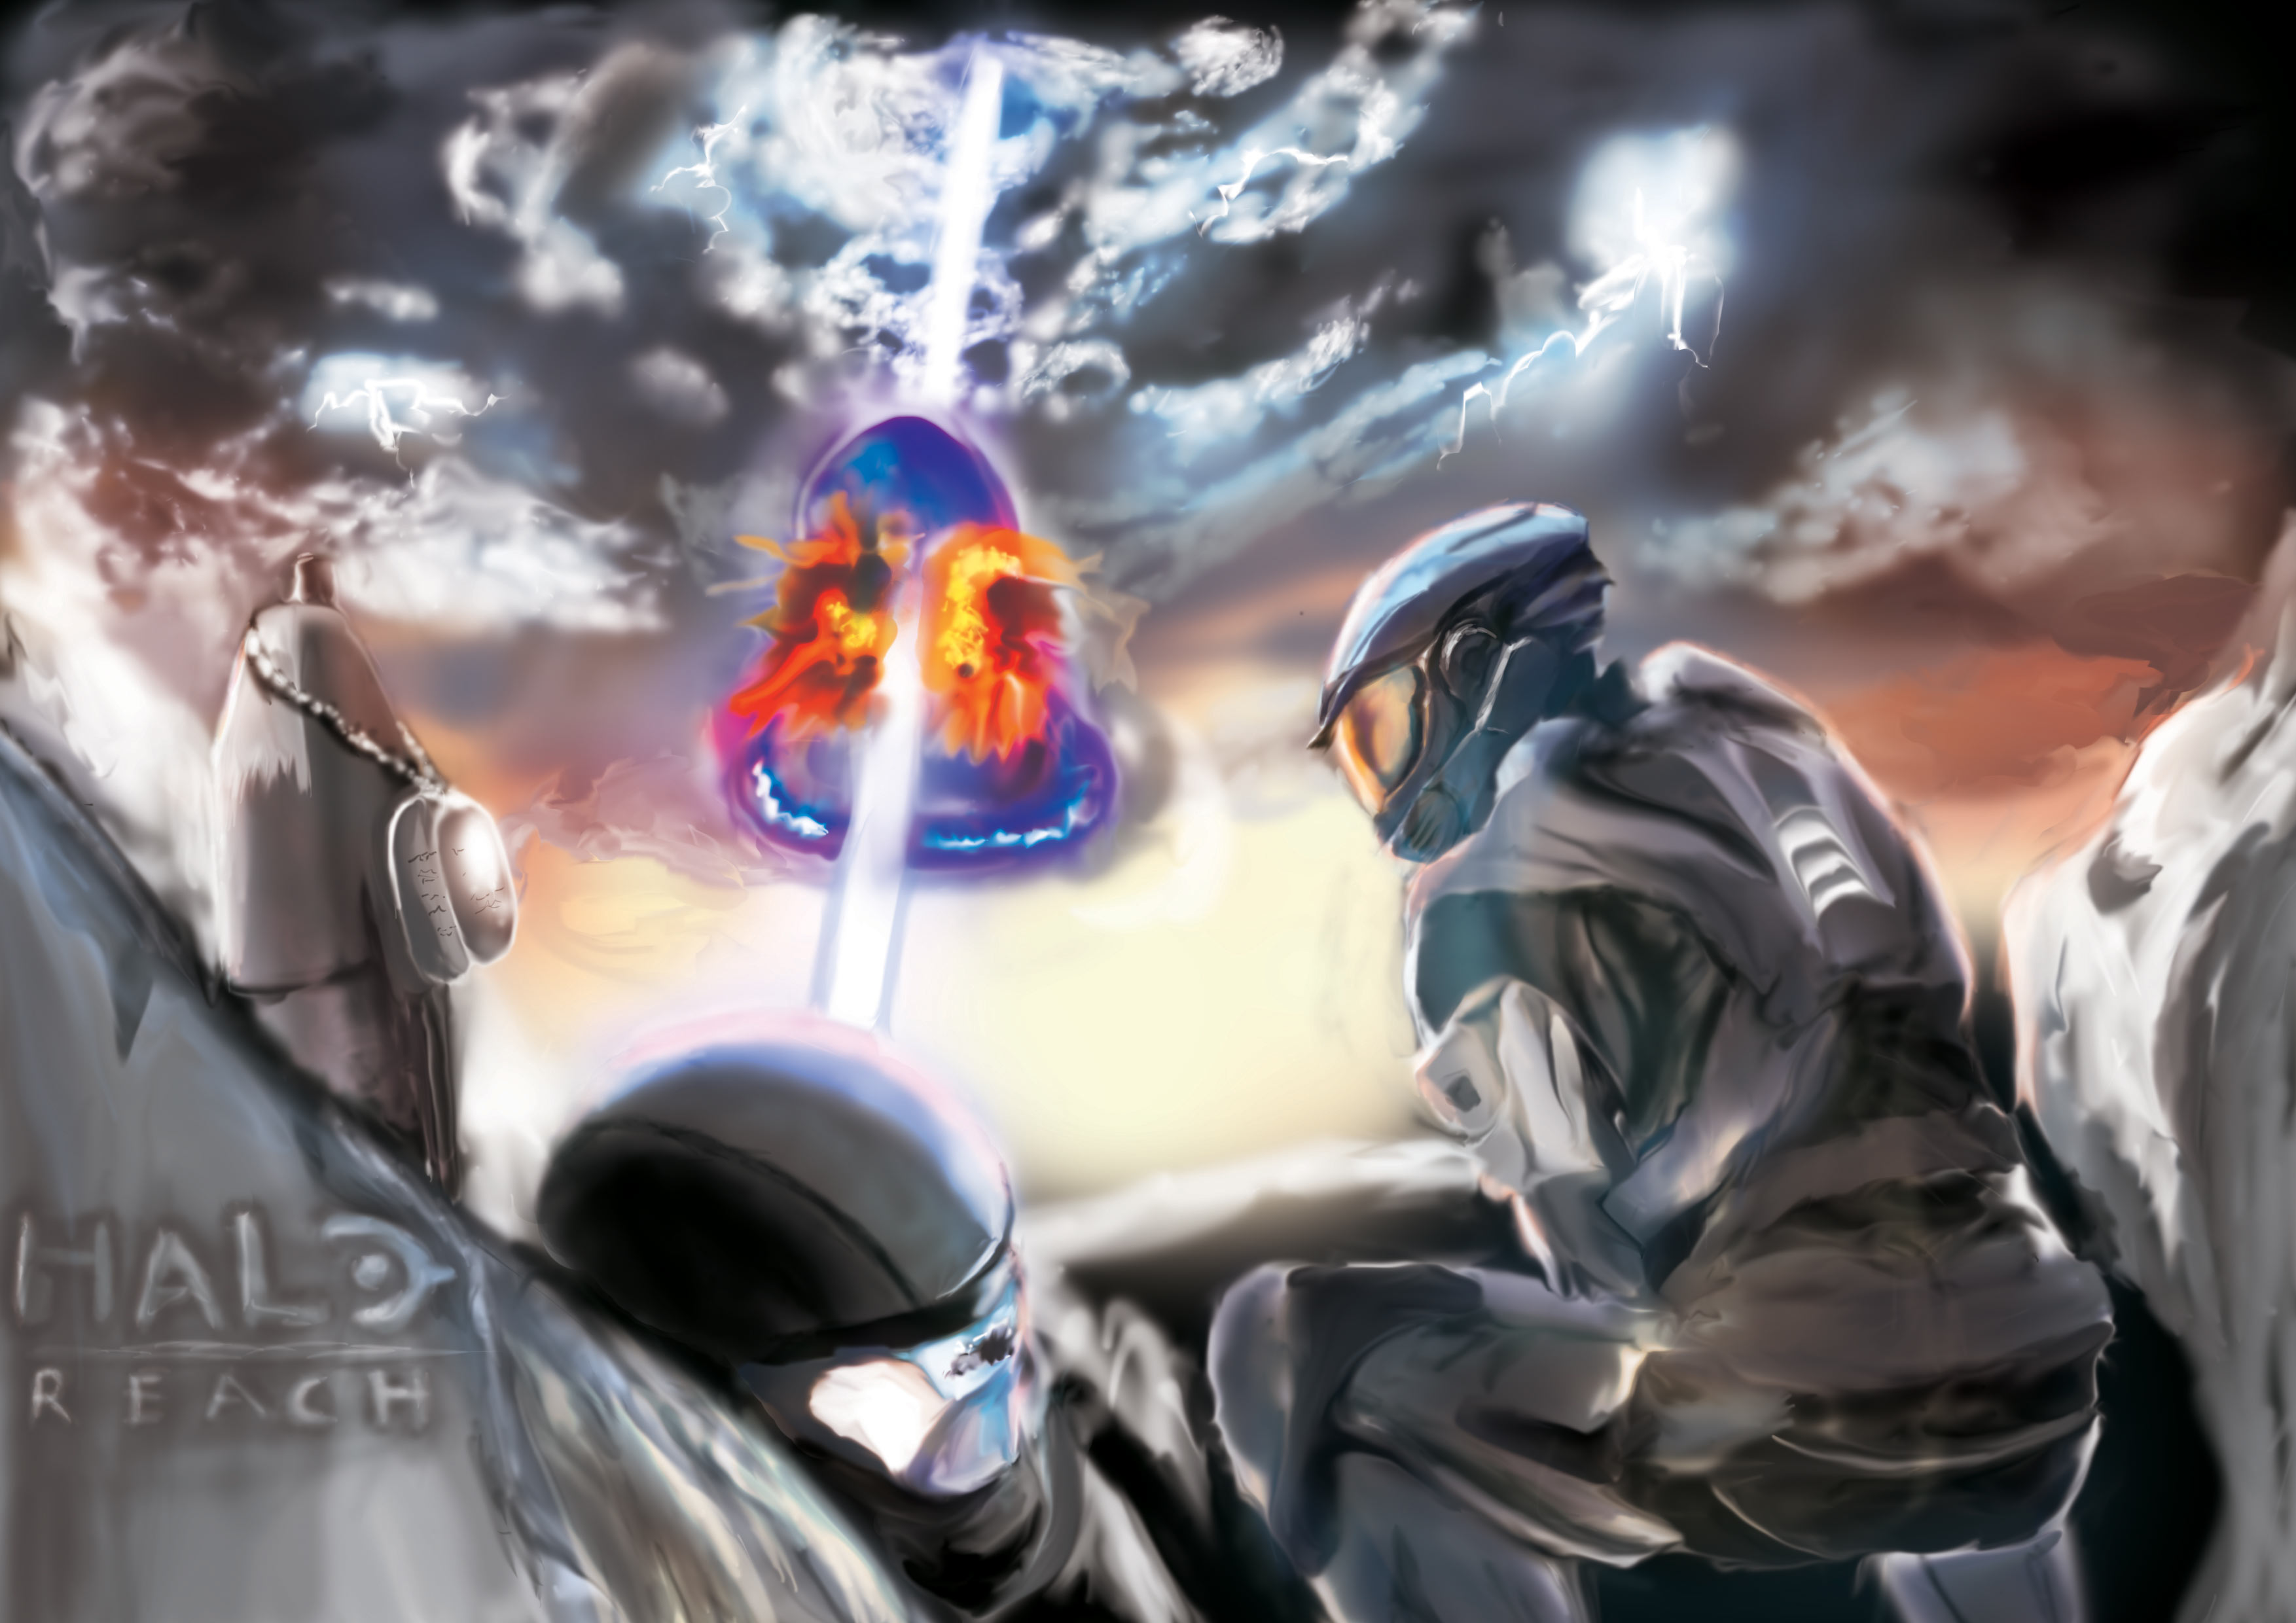 Halo Wallpaper Fall Of Reach Assaultgodzilla Collects Japanese Halo Fan Art Part 4